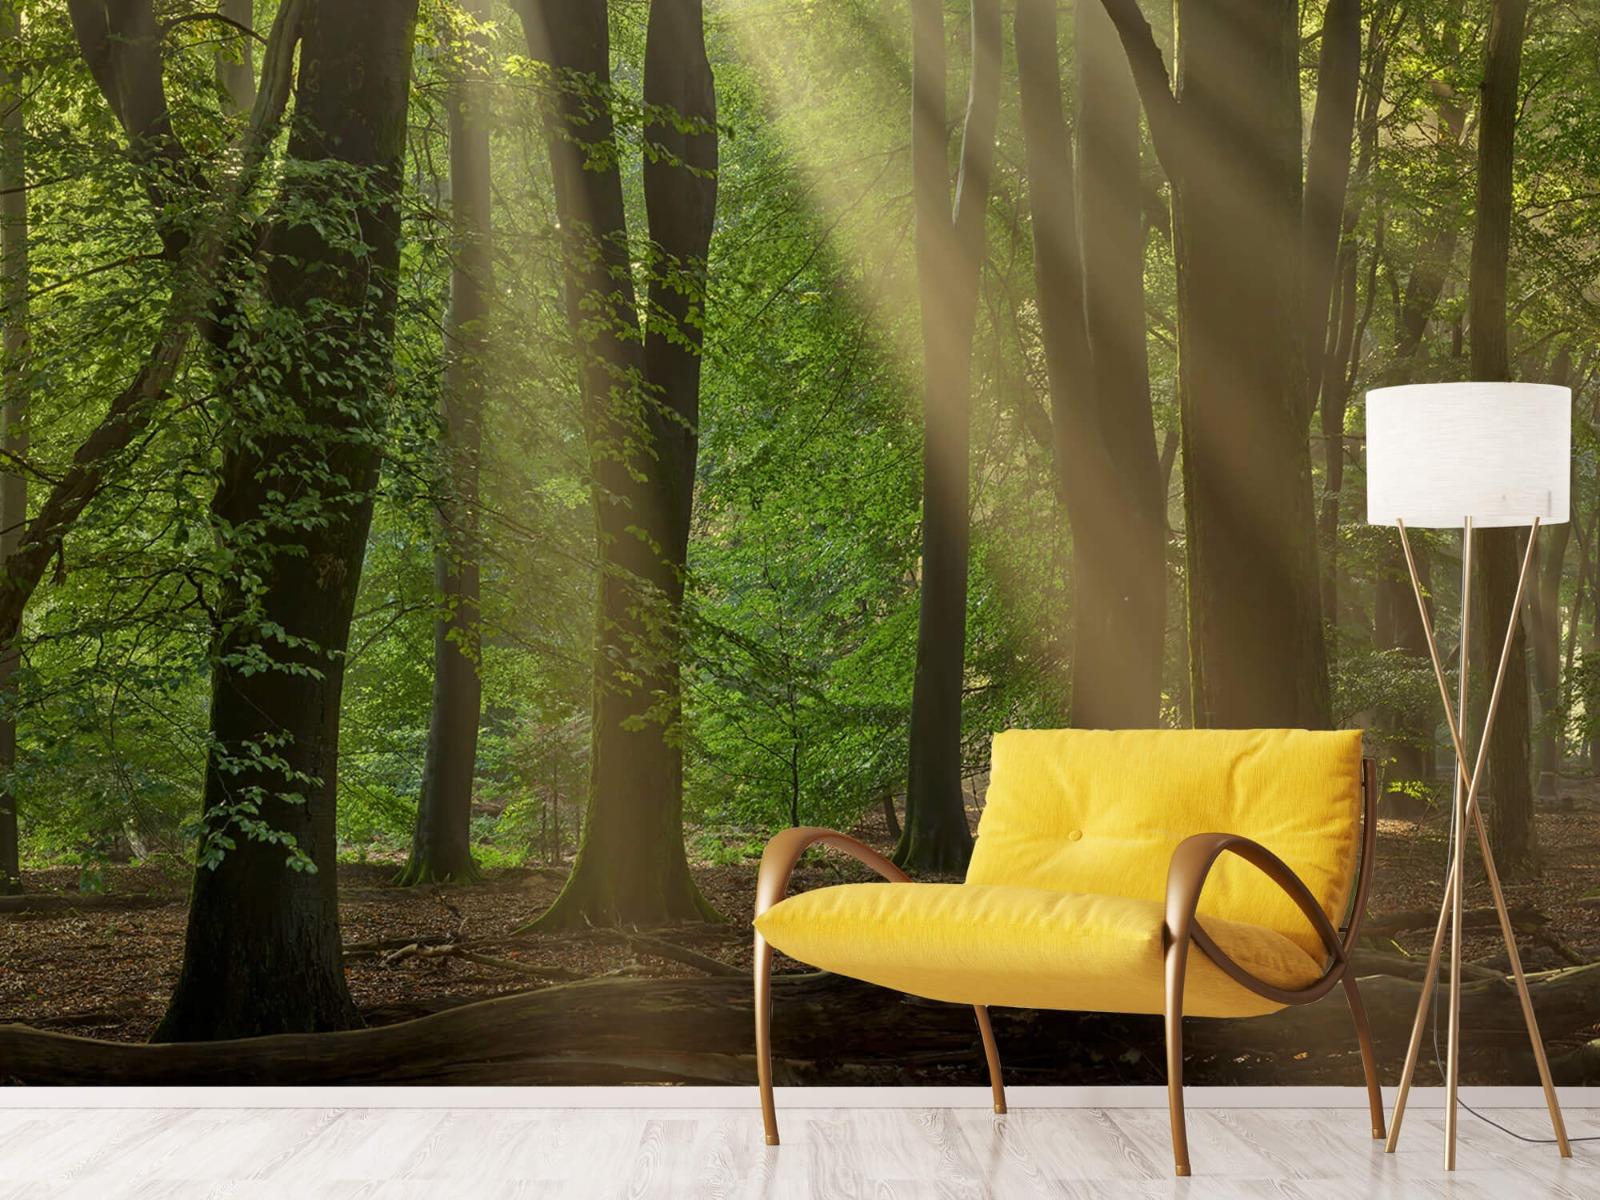 Bomen - Zonneharpen in het bos - Slaapkamer 12